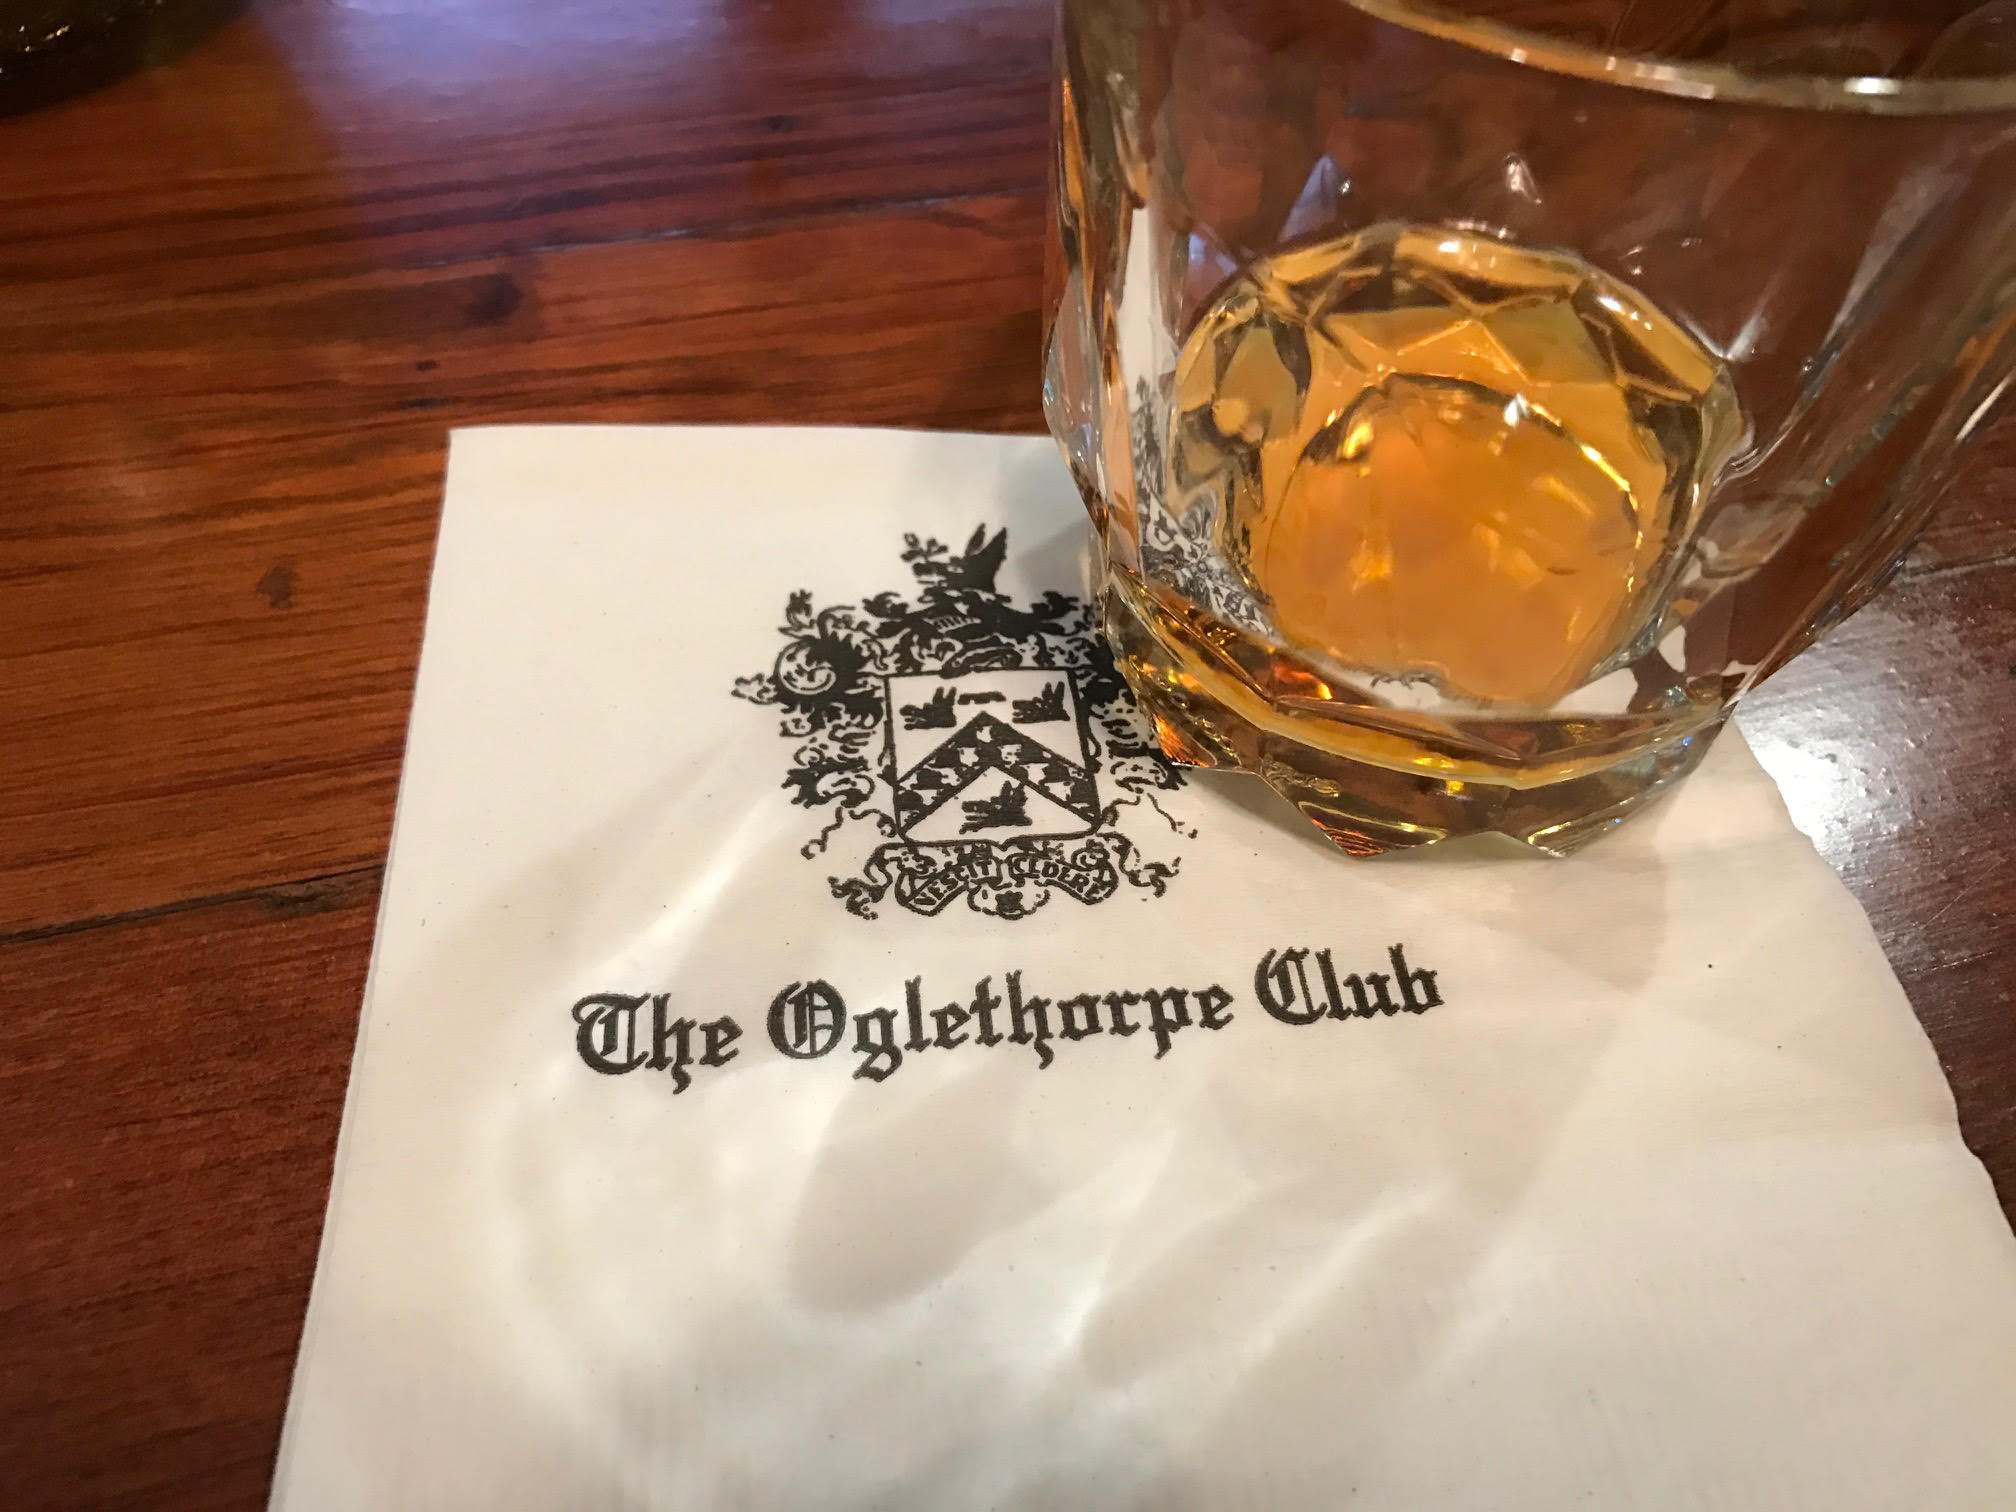 The Oglethorpe Club